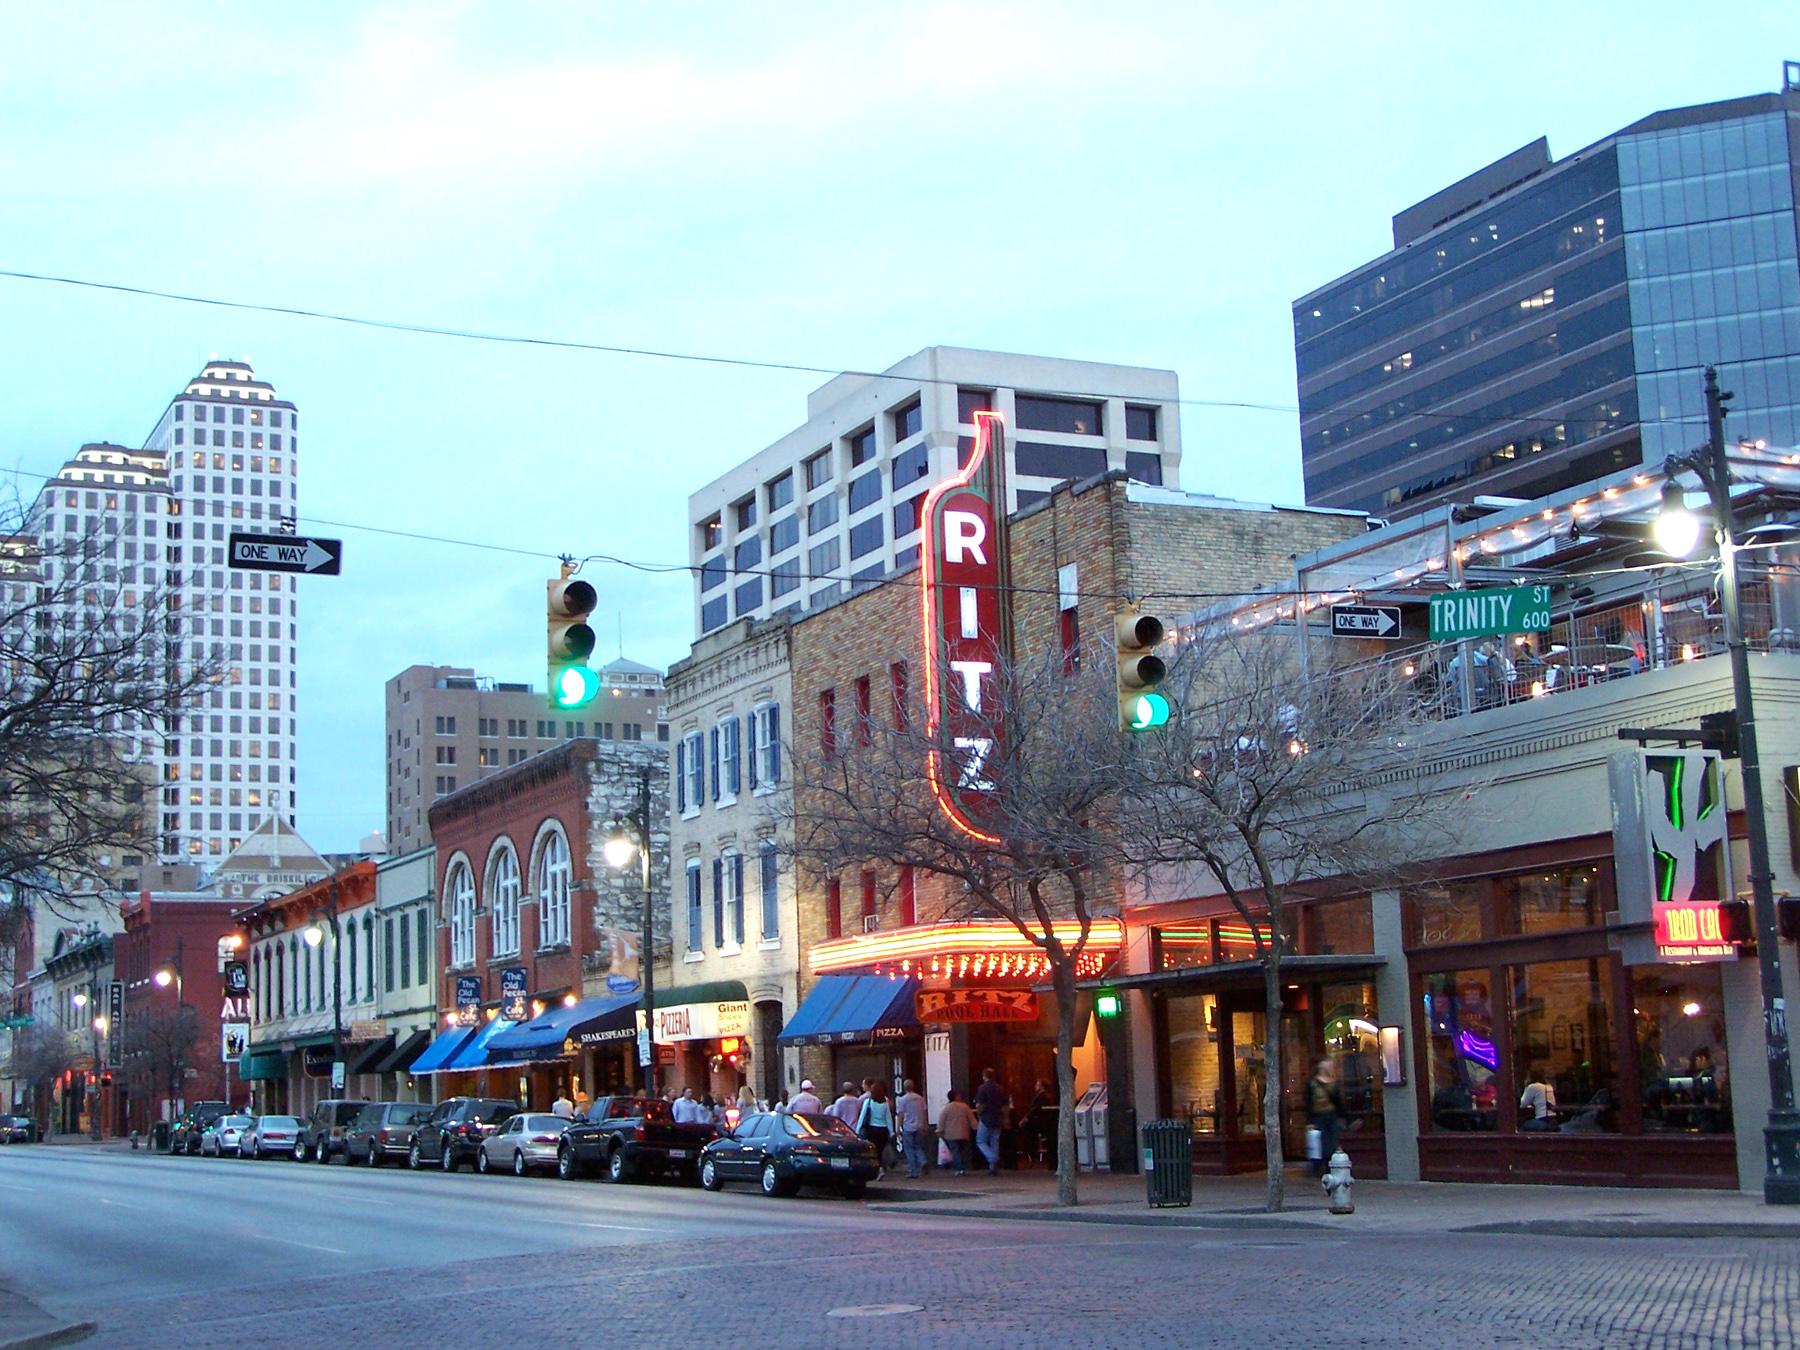 https://i1.wp.com/upload.wikimedia.org/wikipedia/commons/b/b7/Sixth_Street_Austin.jpg